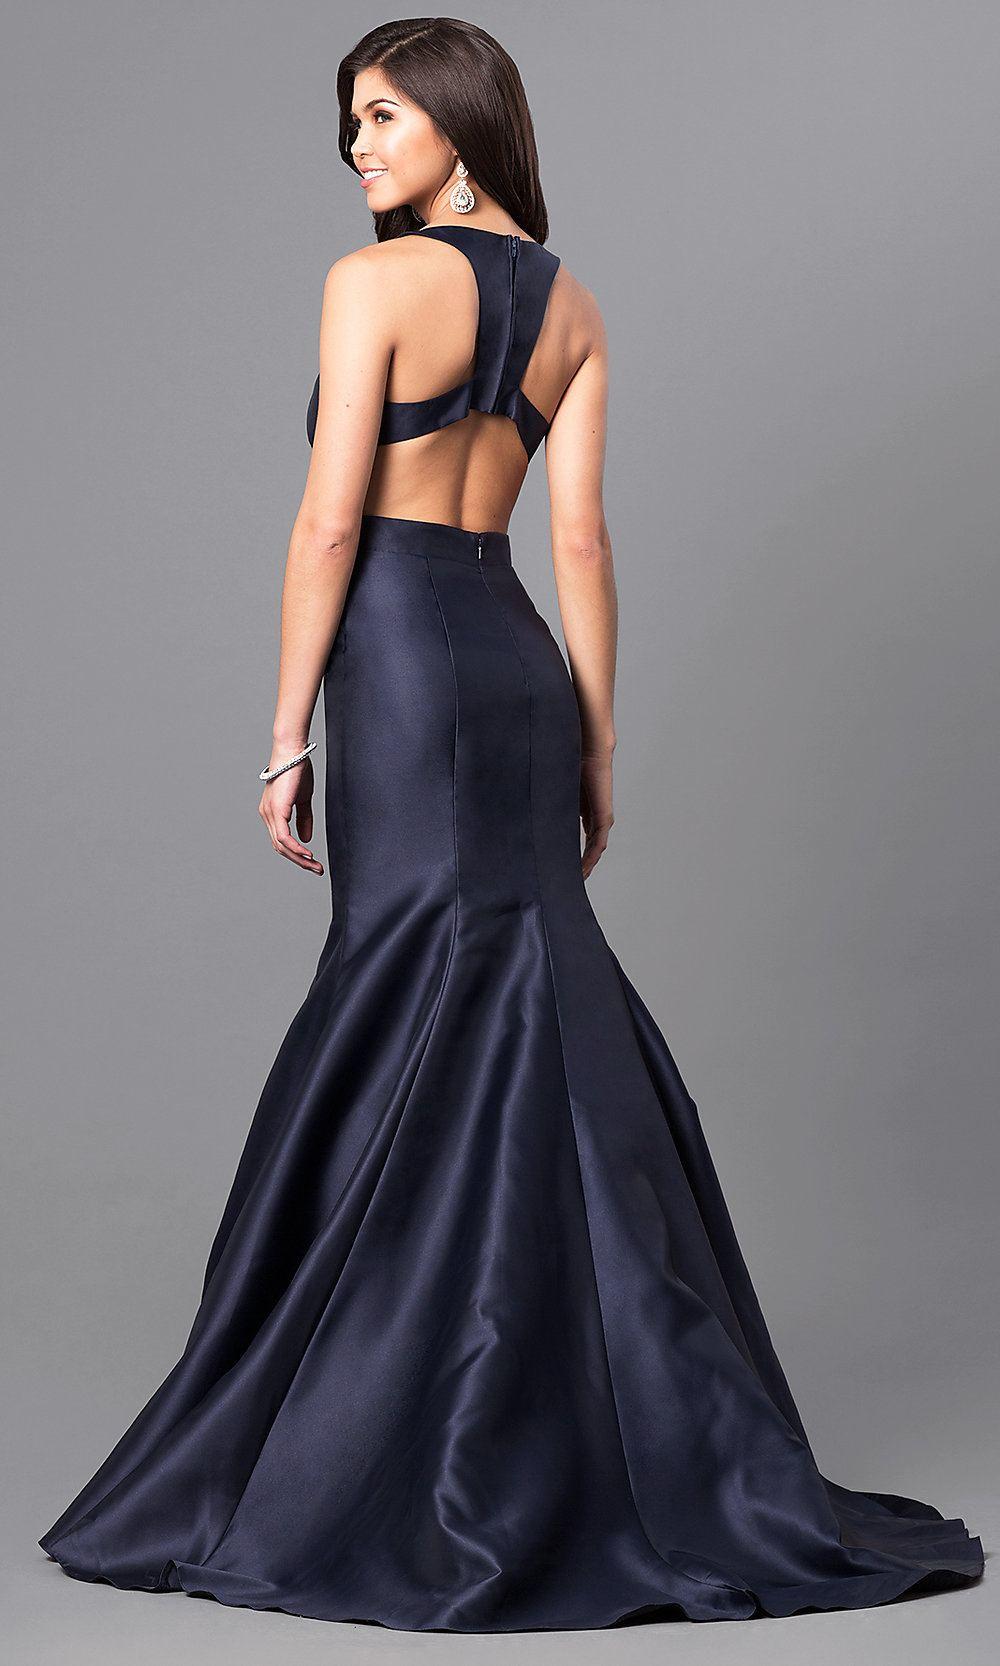 Latest Design Princess Ball Gown Wedding Dresses Sweetheart W1426 See Through Handmade Long Bridal Gowns Dazzling Gorgeous Best Made Wedding Dress Designers